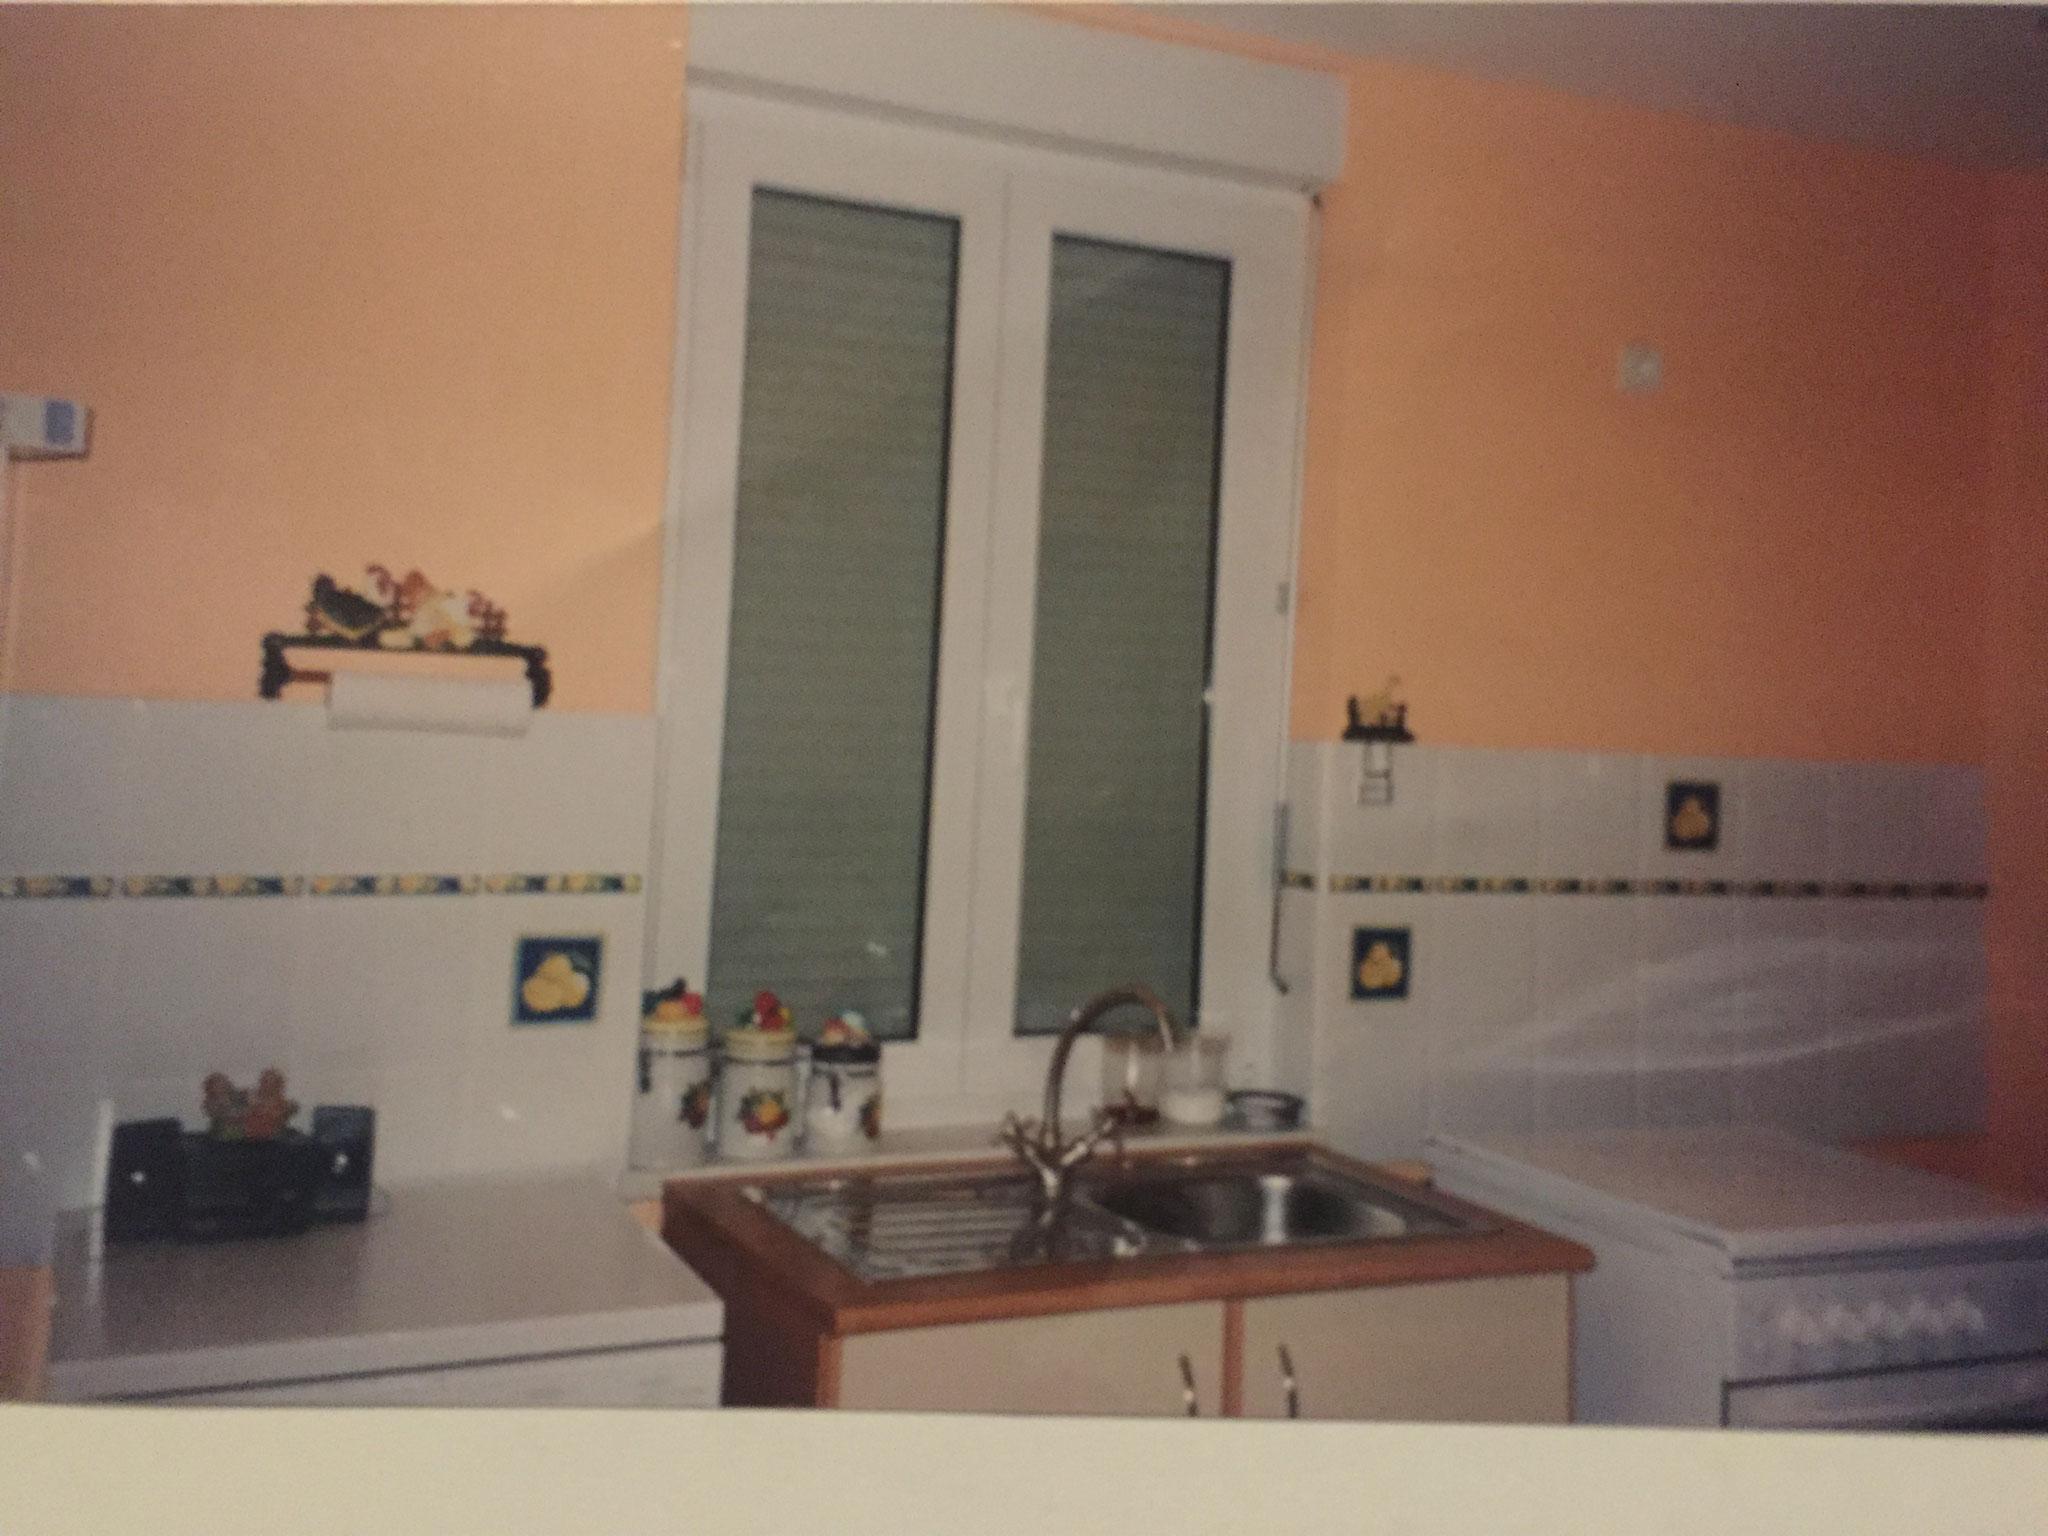 Crédence de cuisine en carrelage Activ Renovation Illkirch-Graffenstaden 67